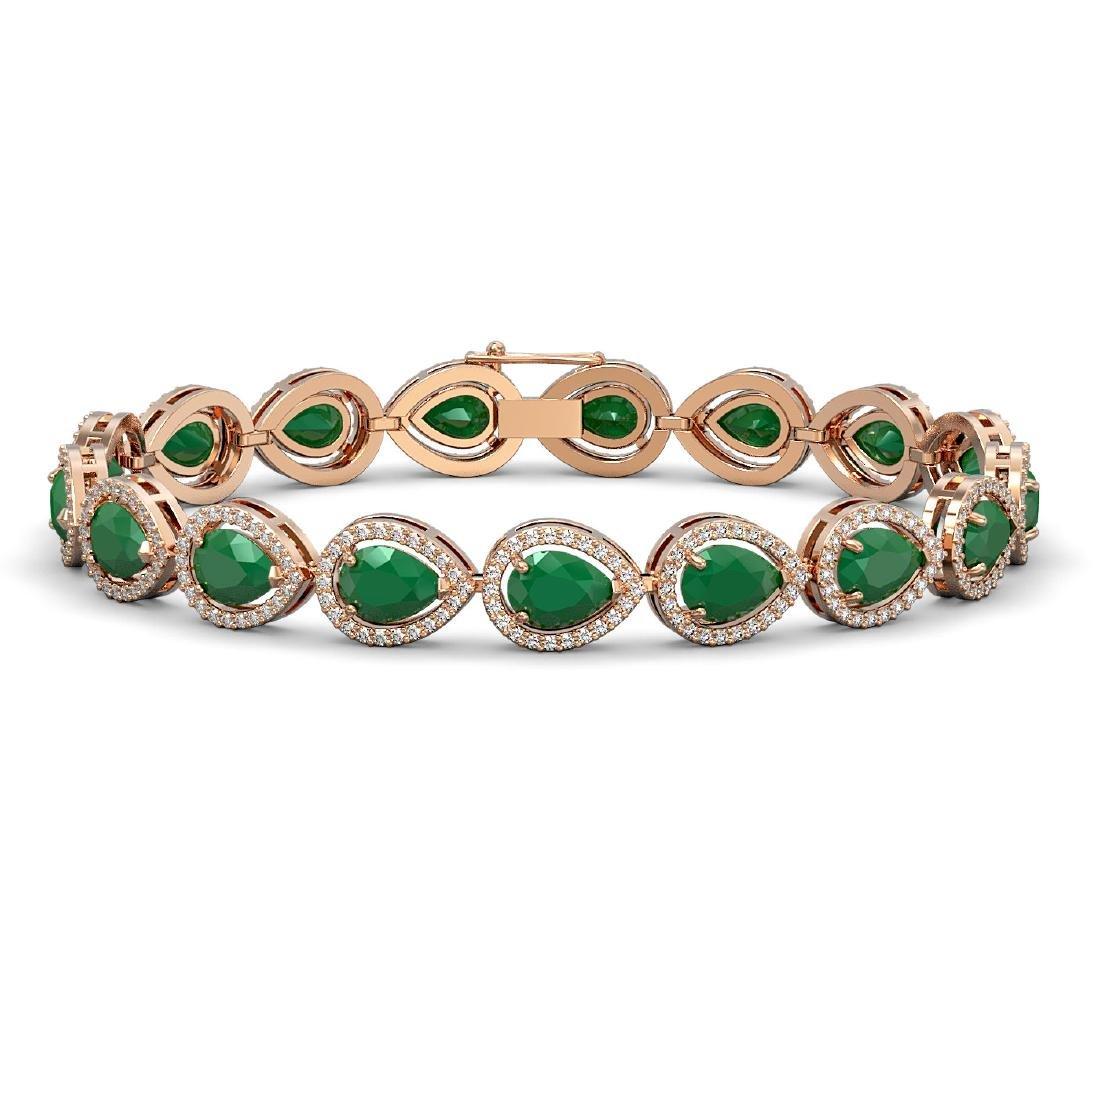 21.69 CTW Emerald & Diamond Halo Bracelet 10K Rose Gold